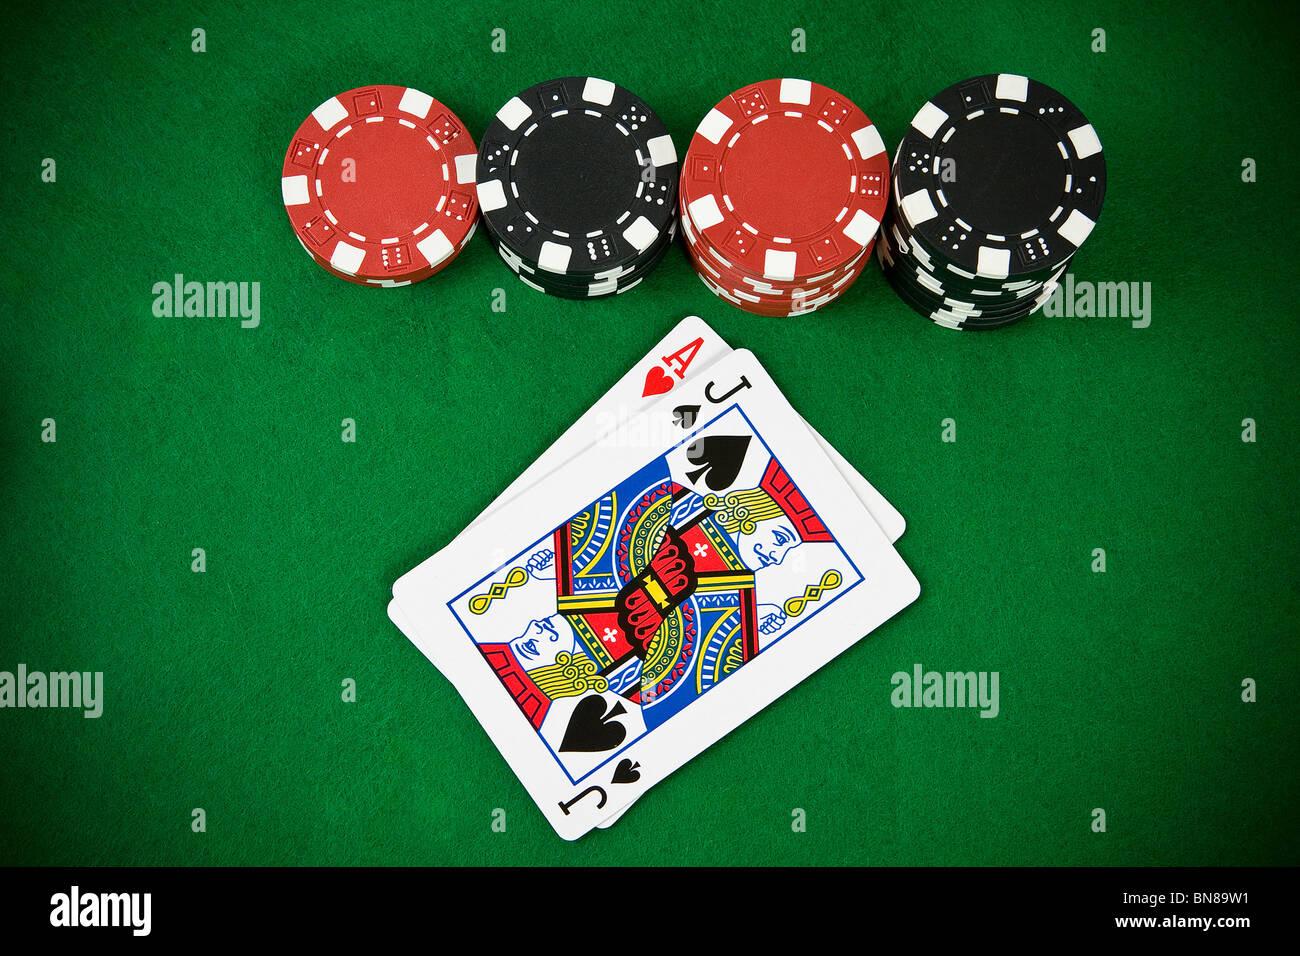 Gala casino mobile download